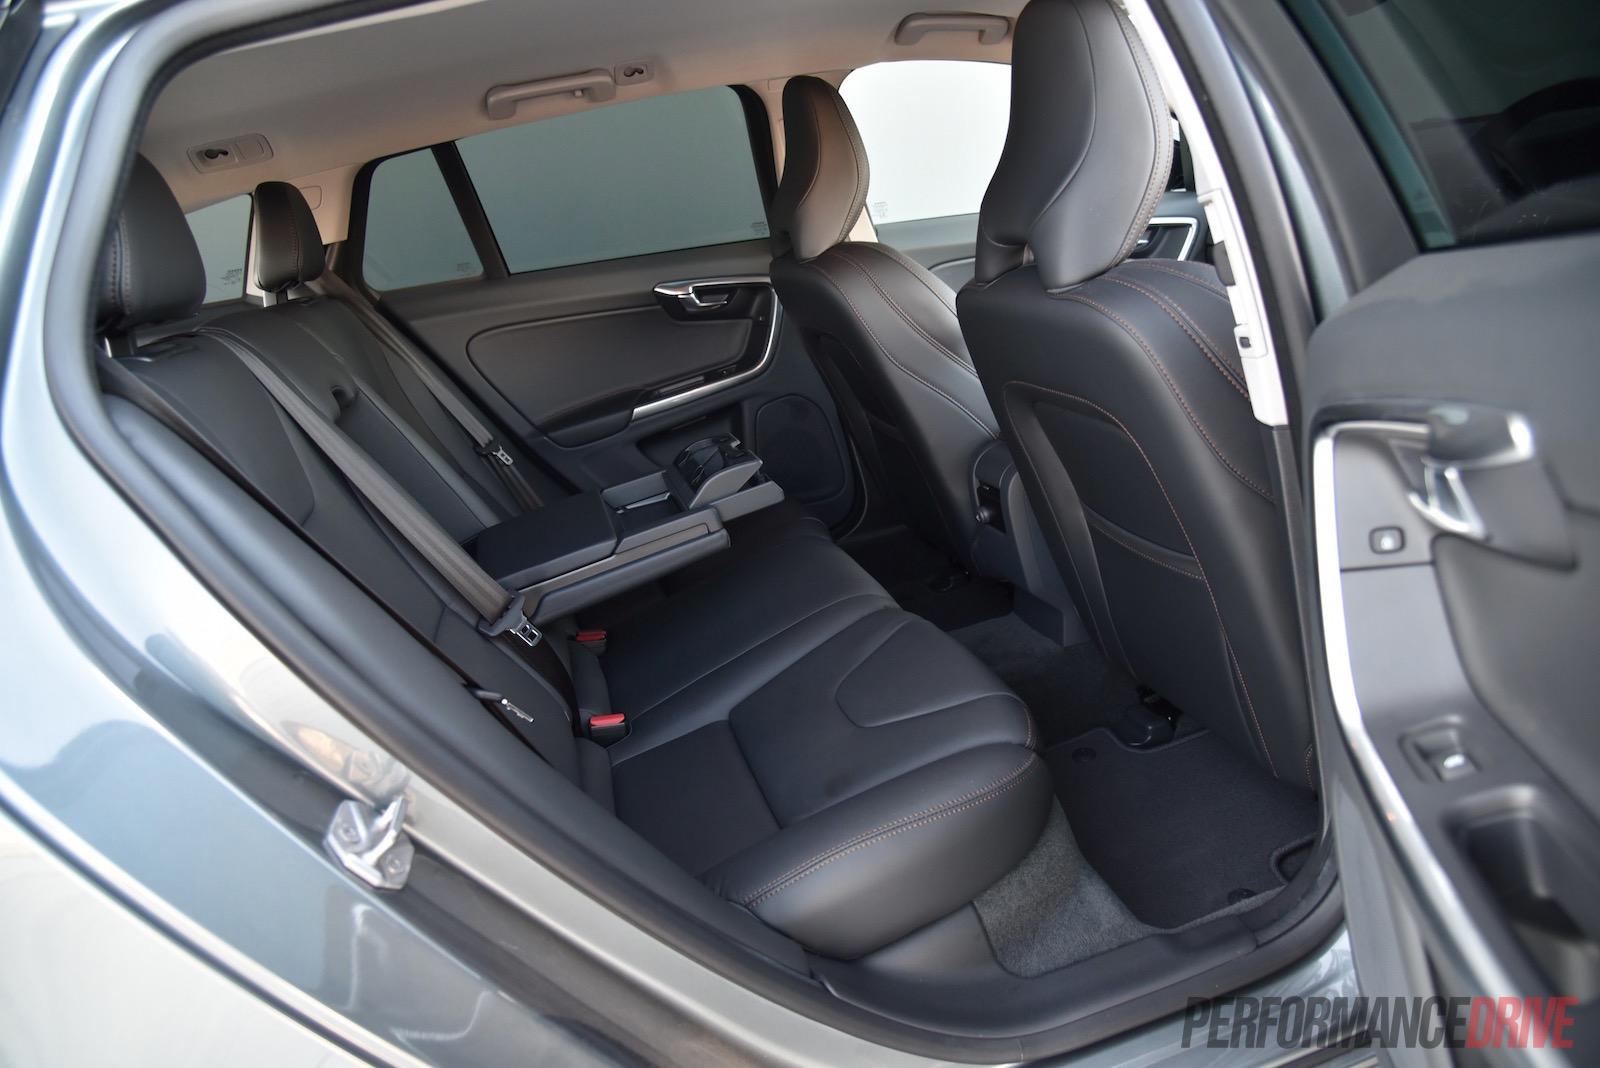 2016 Volvo V60 Cross Country Rear Seats